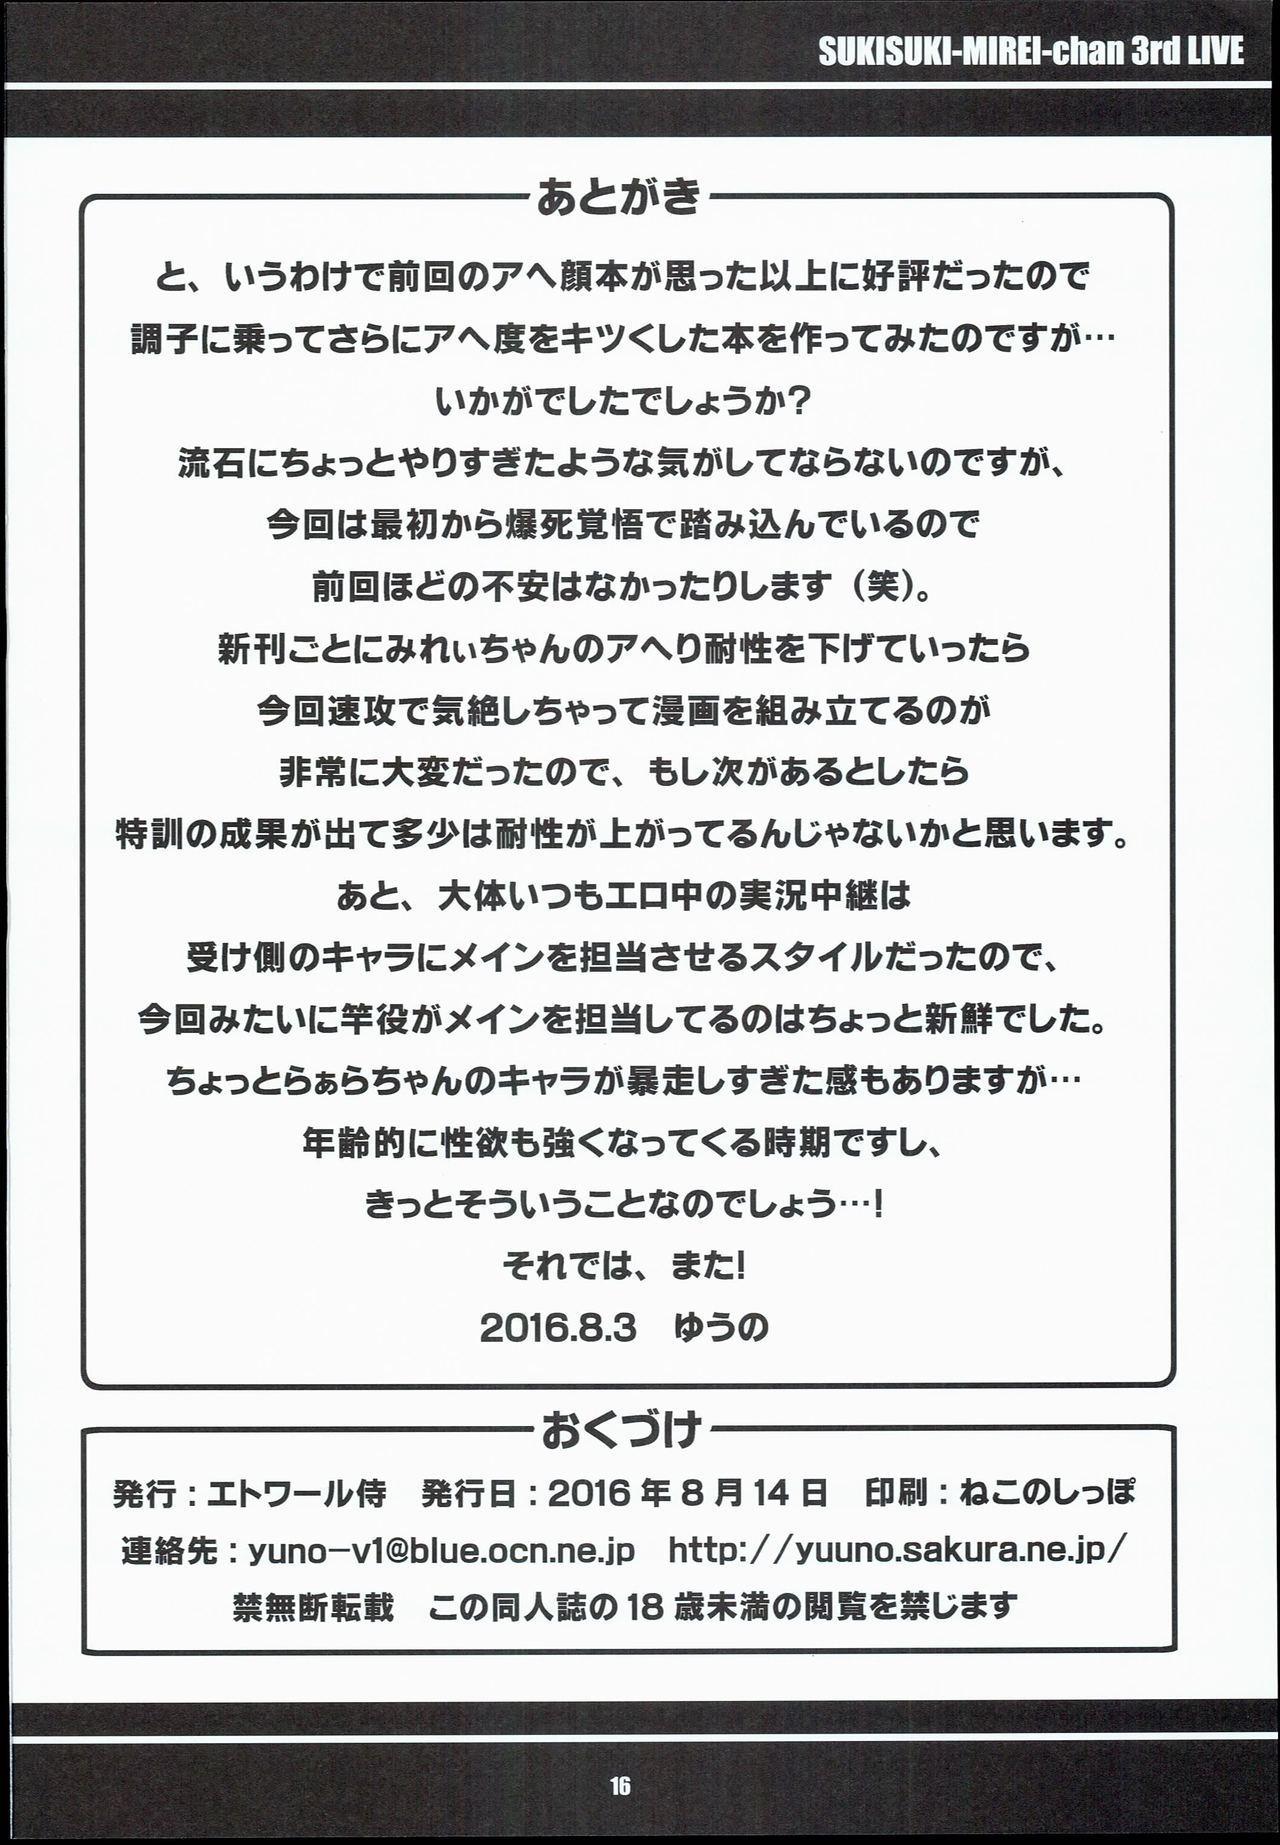 Suki Suki Mirei-chan 3rd LIVE 17